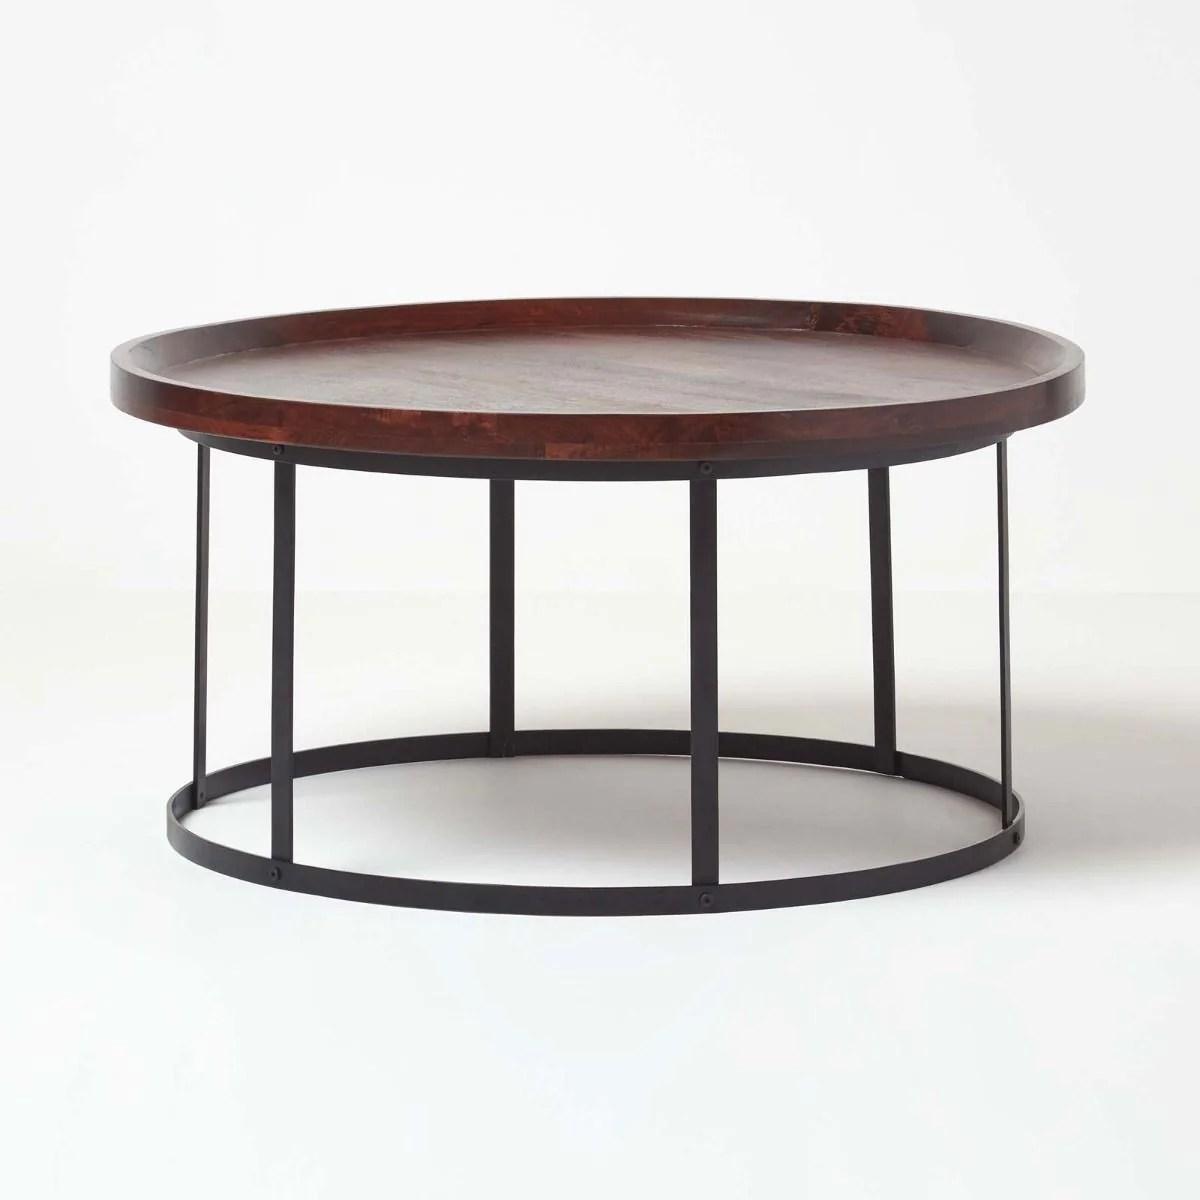 adroit furnish solid wood coffee table finish color light walnut adroit furnish